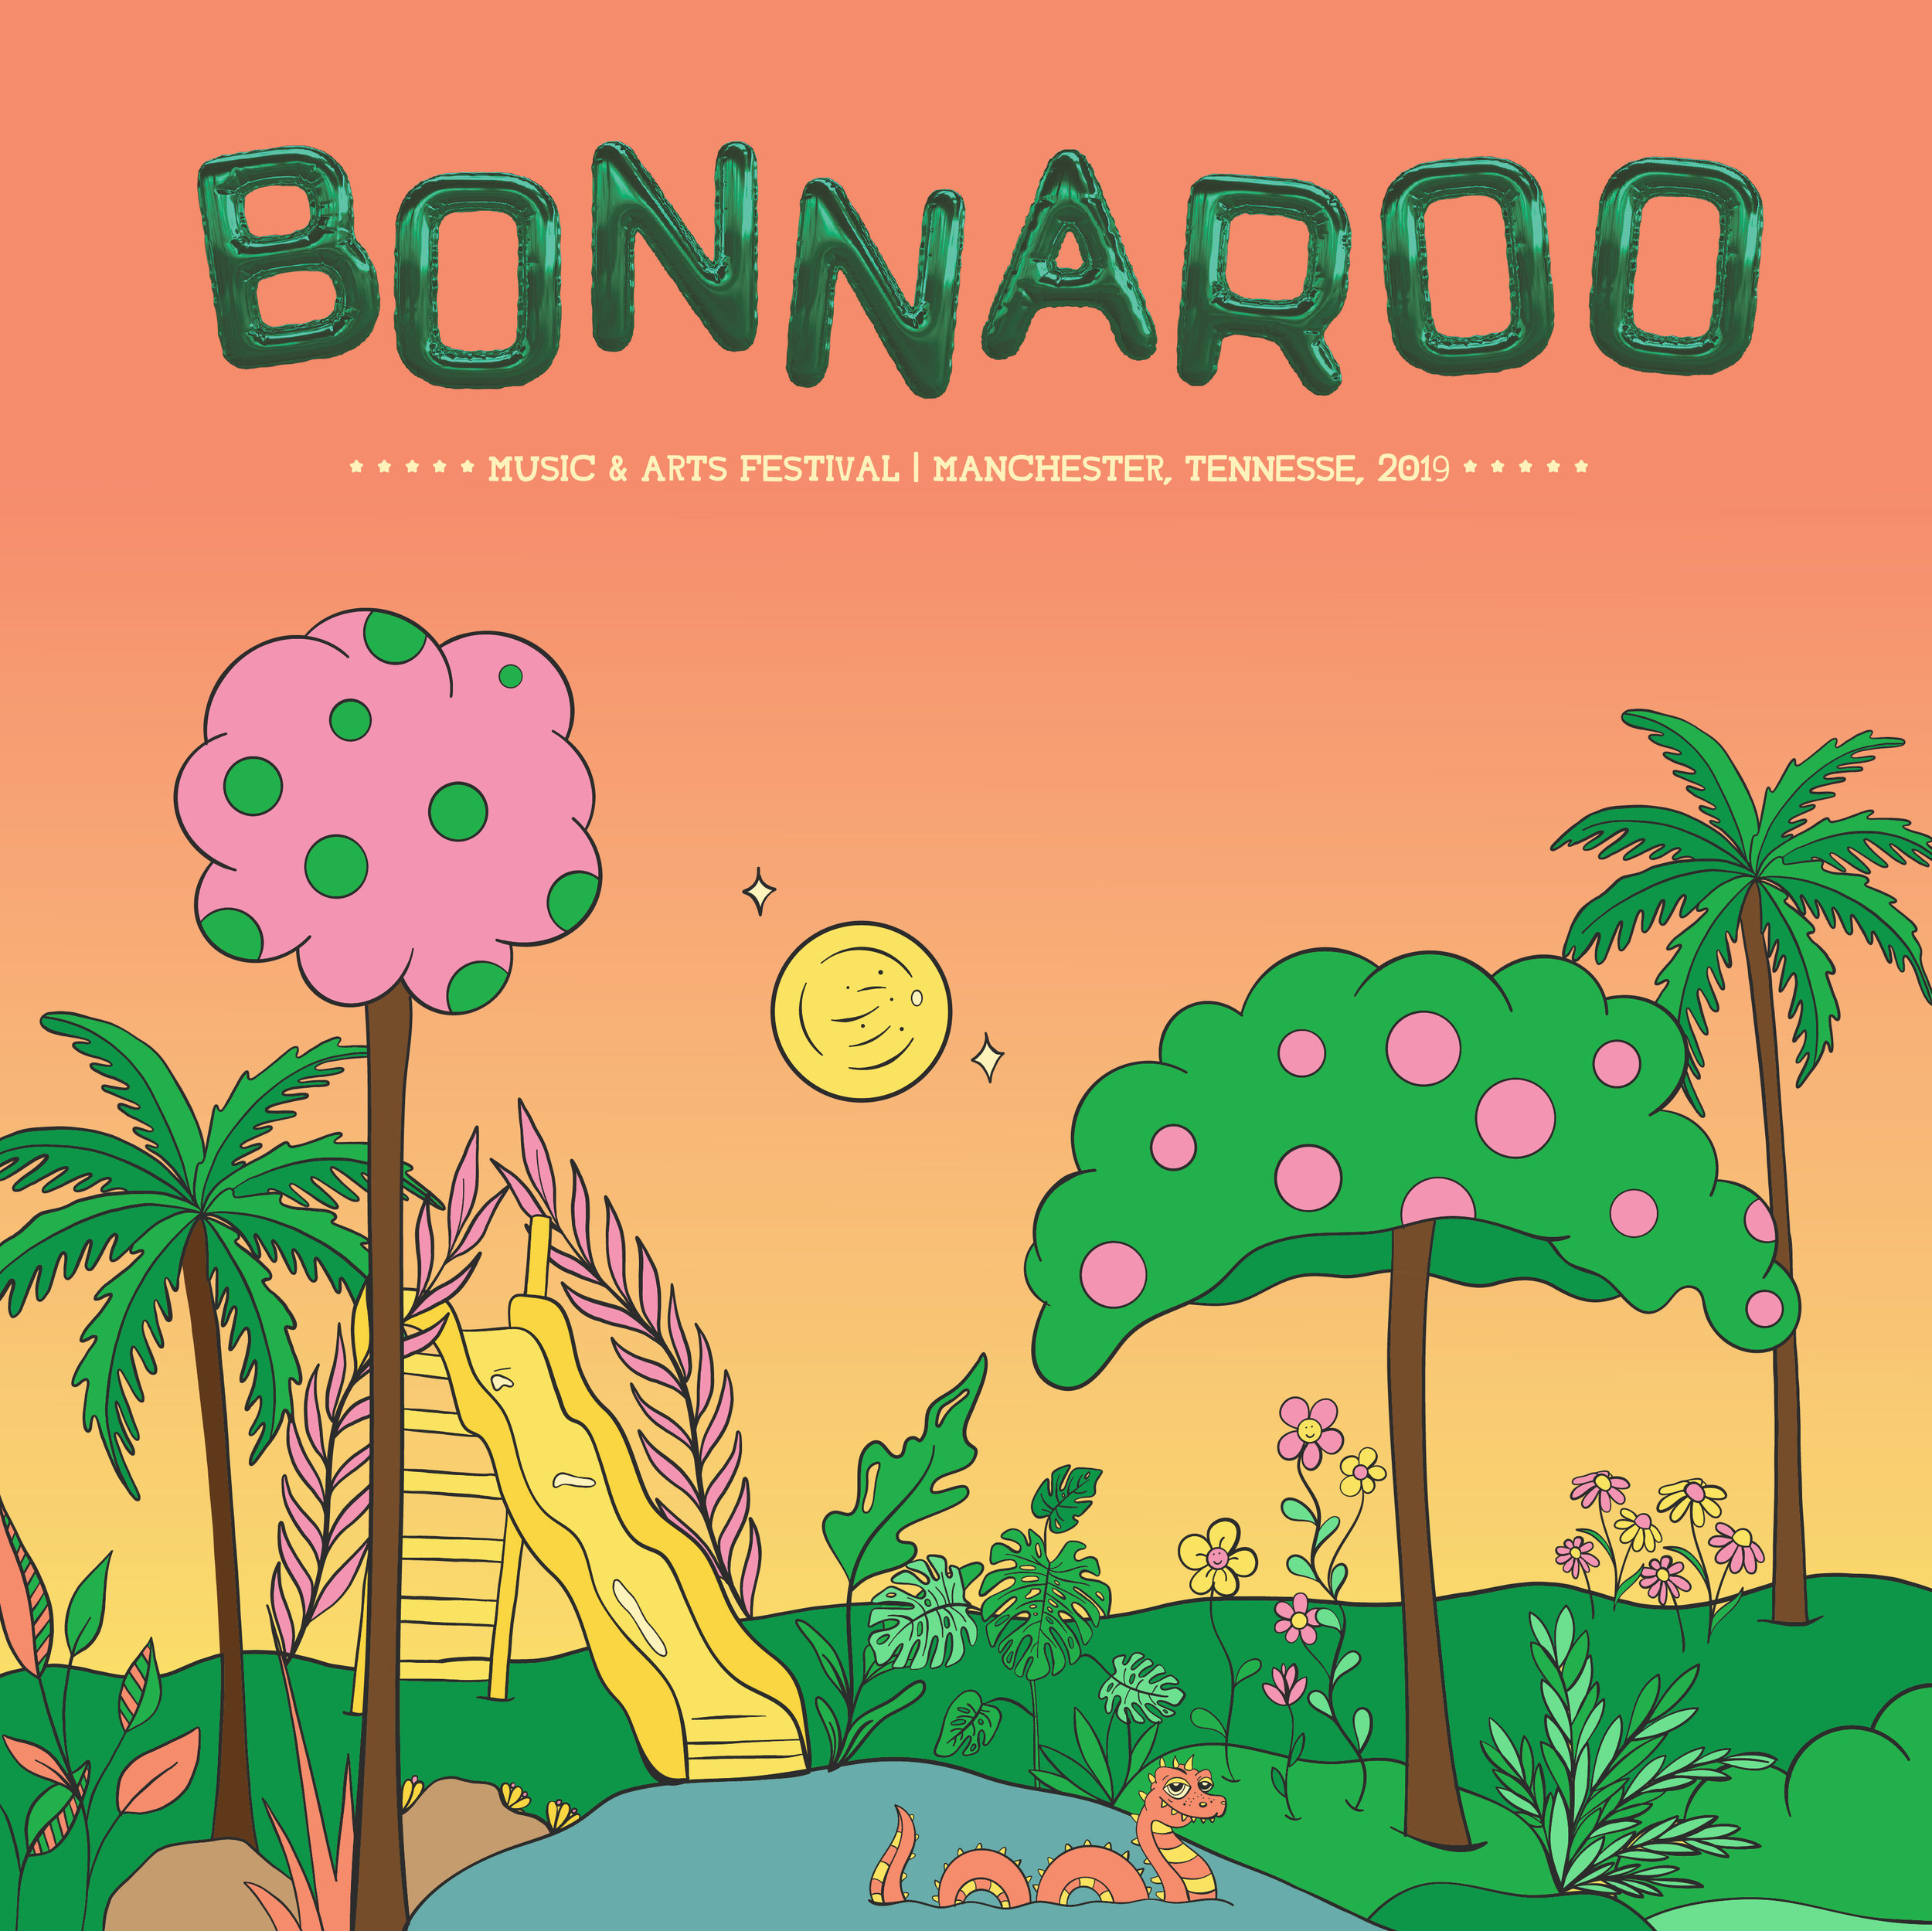 bonaroo-02.jpg